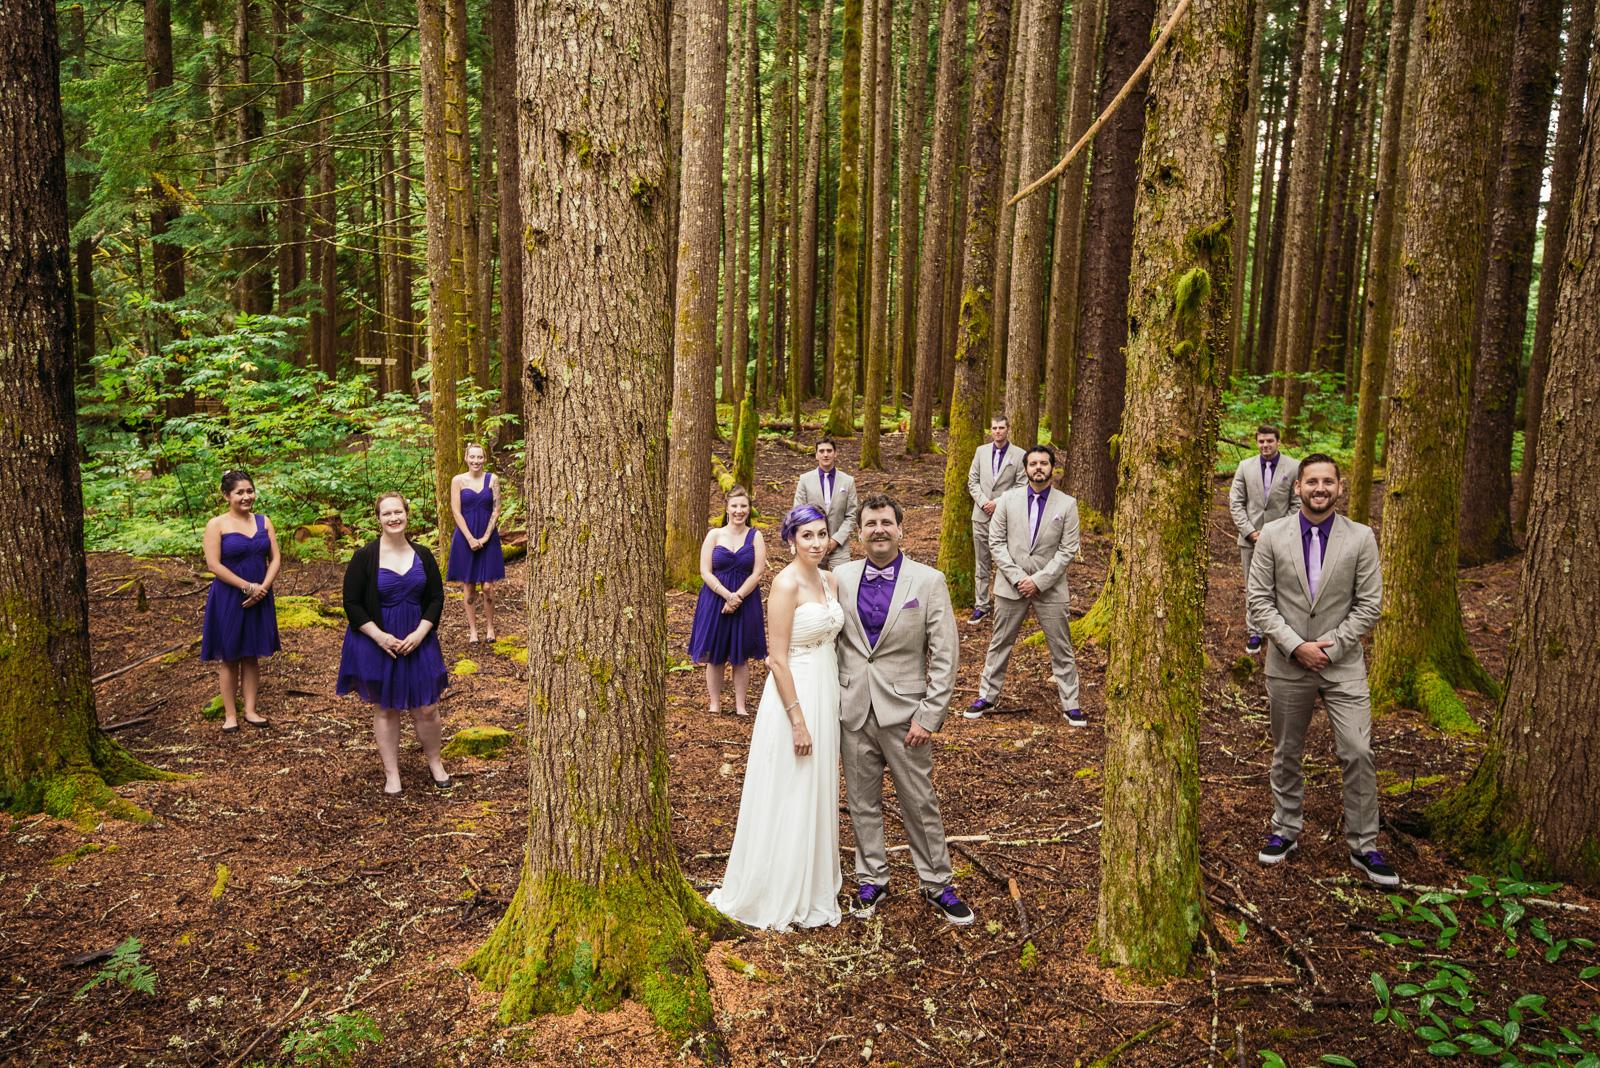 bc-wedding-photographers-kitimat-minette-bay-lodge-wedding-17.jpg